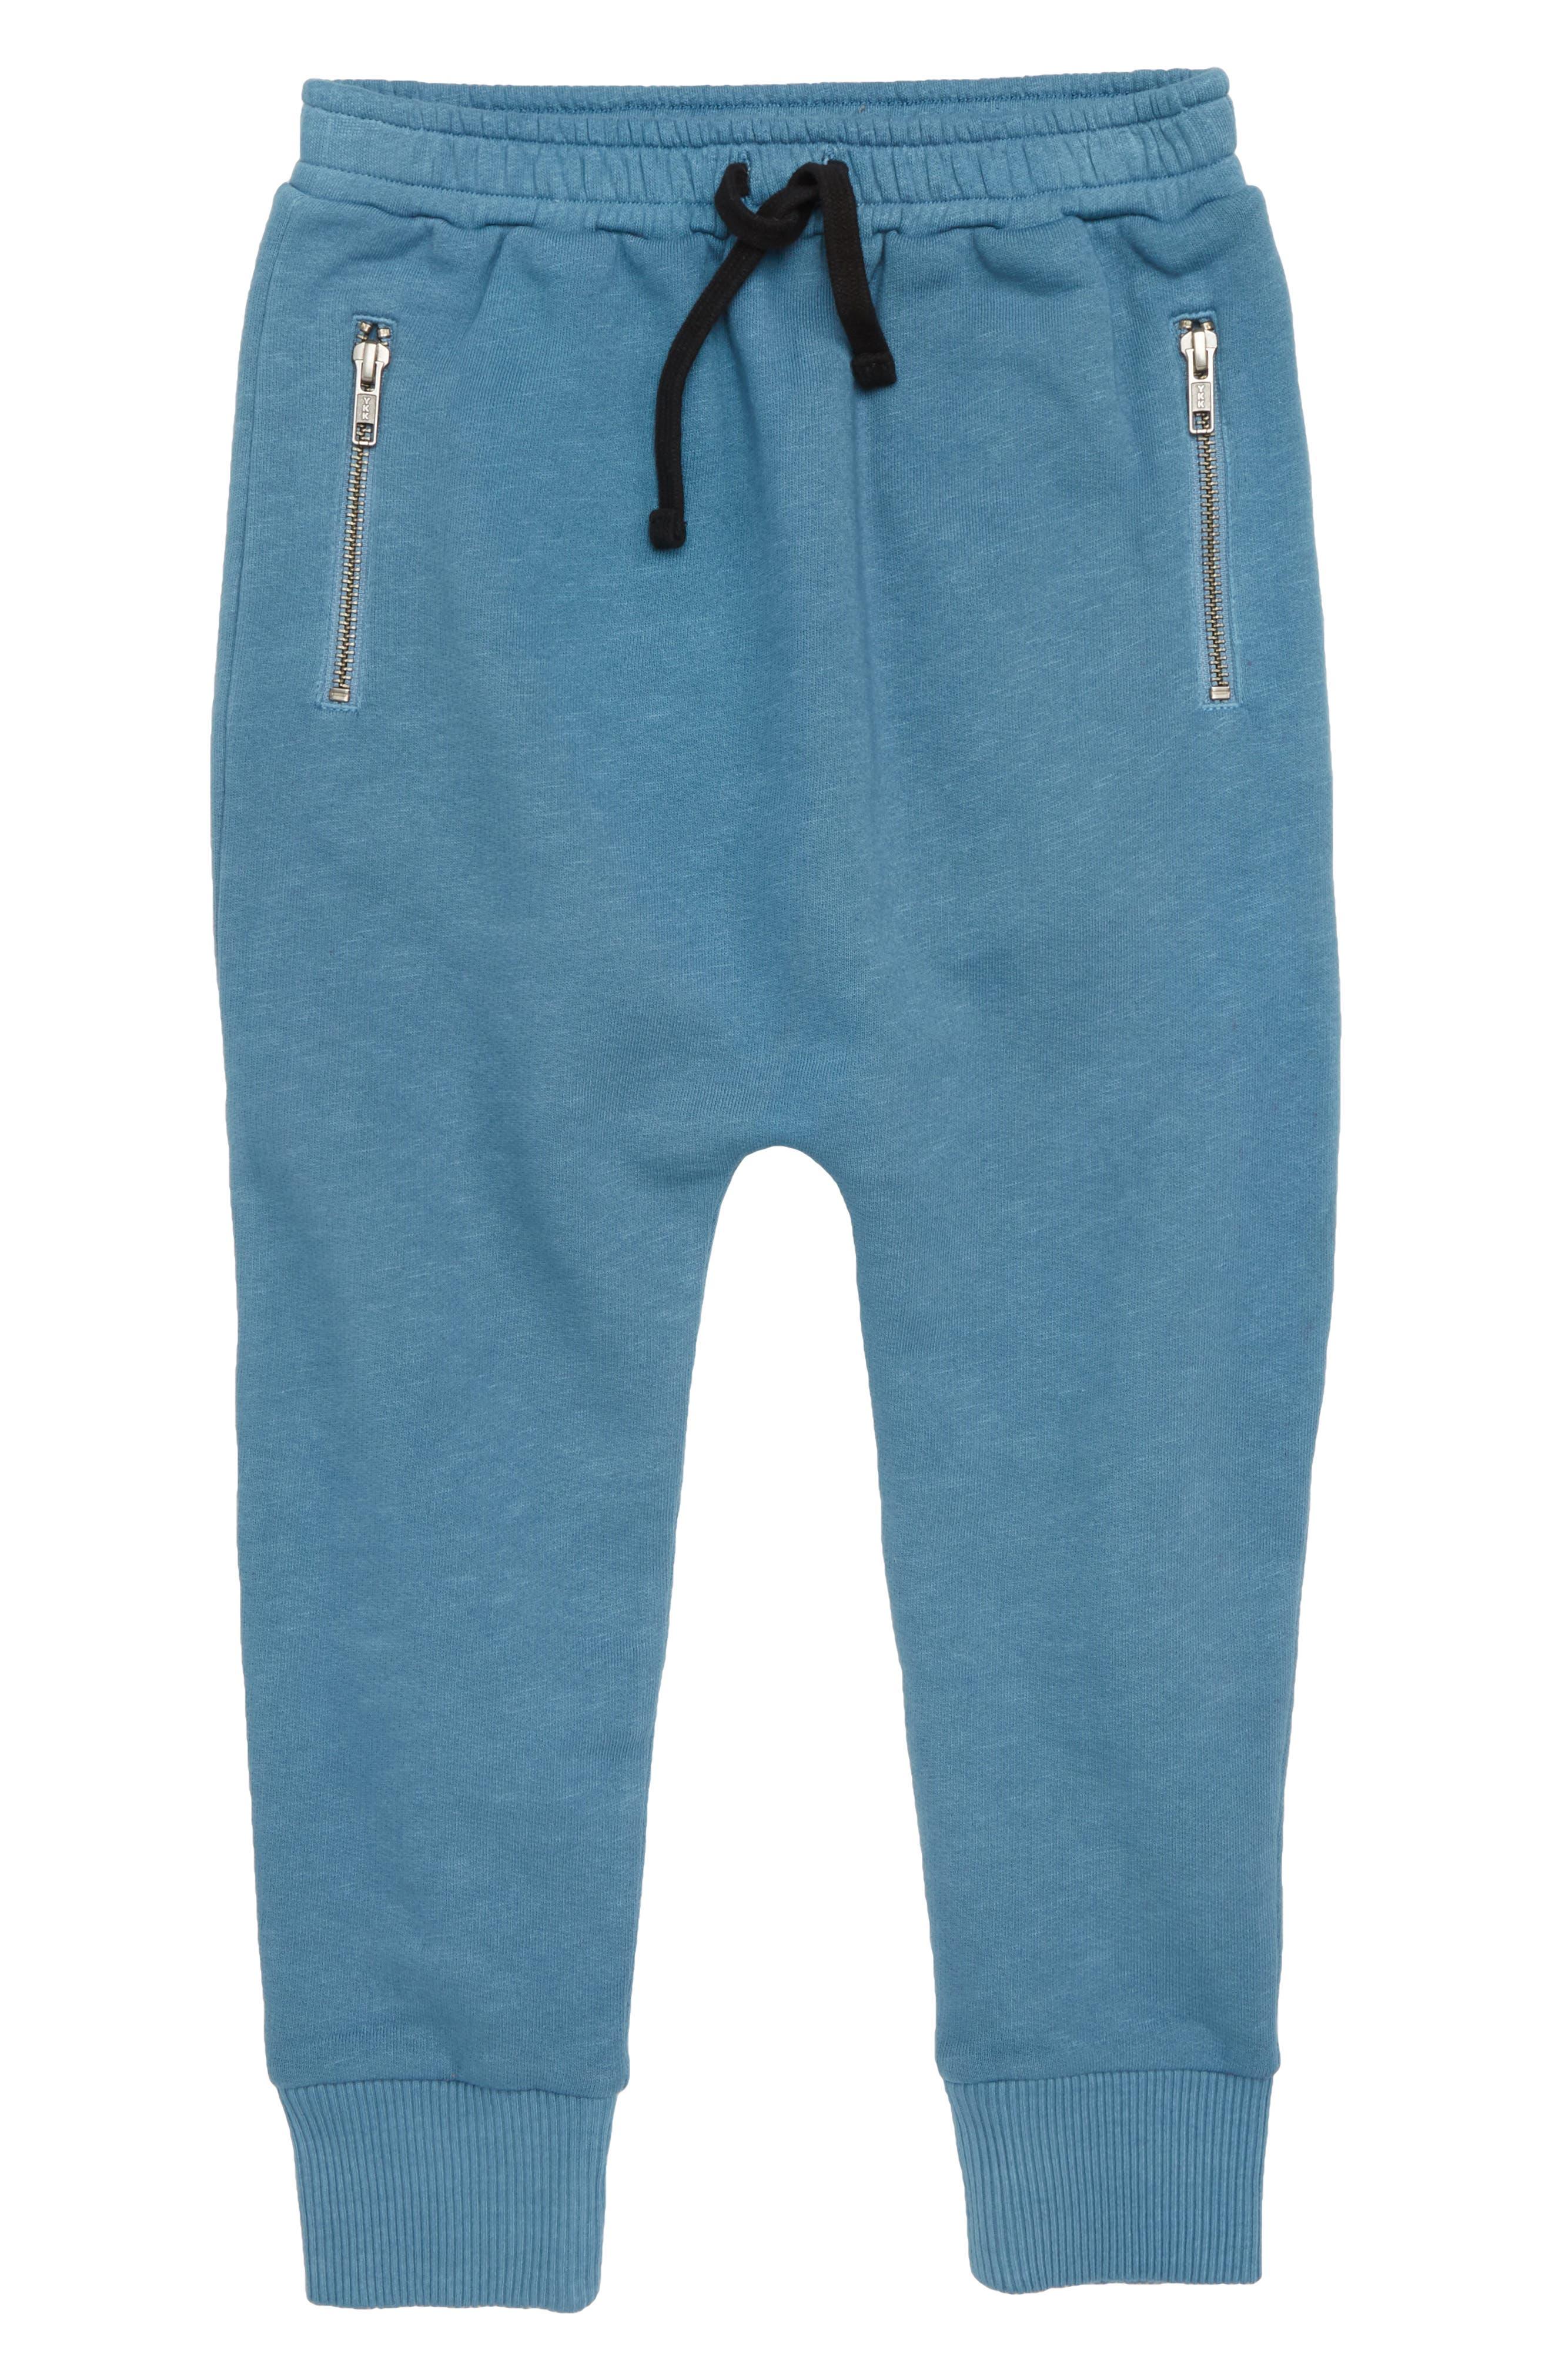 Zip Jogger Pants,                             Main thumbnail 1, color,                             Blue Stellar